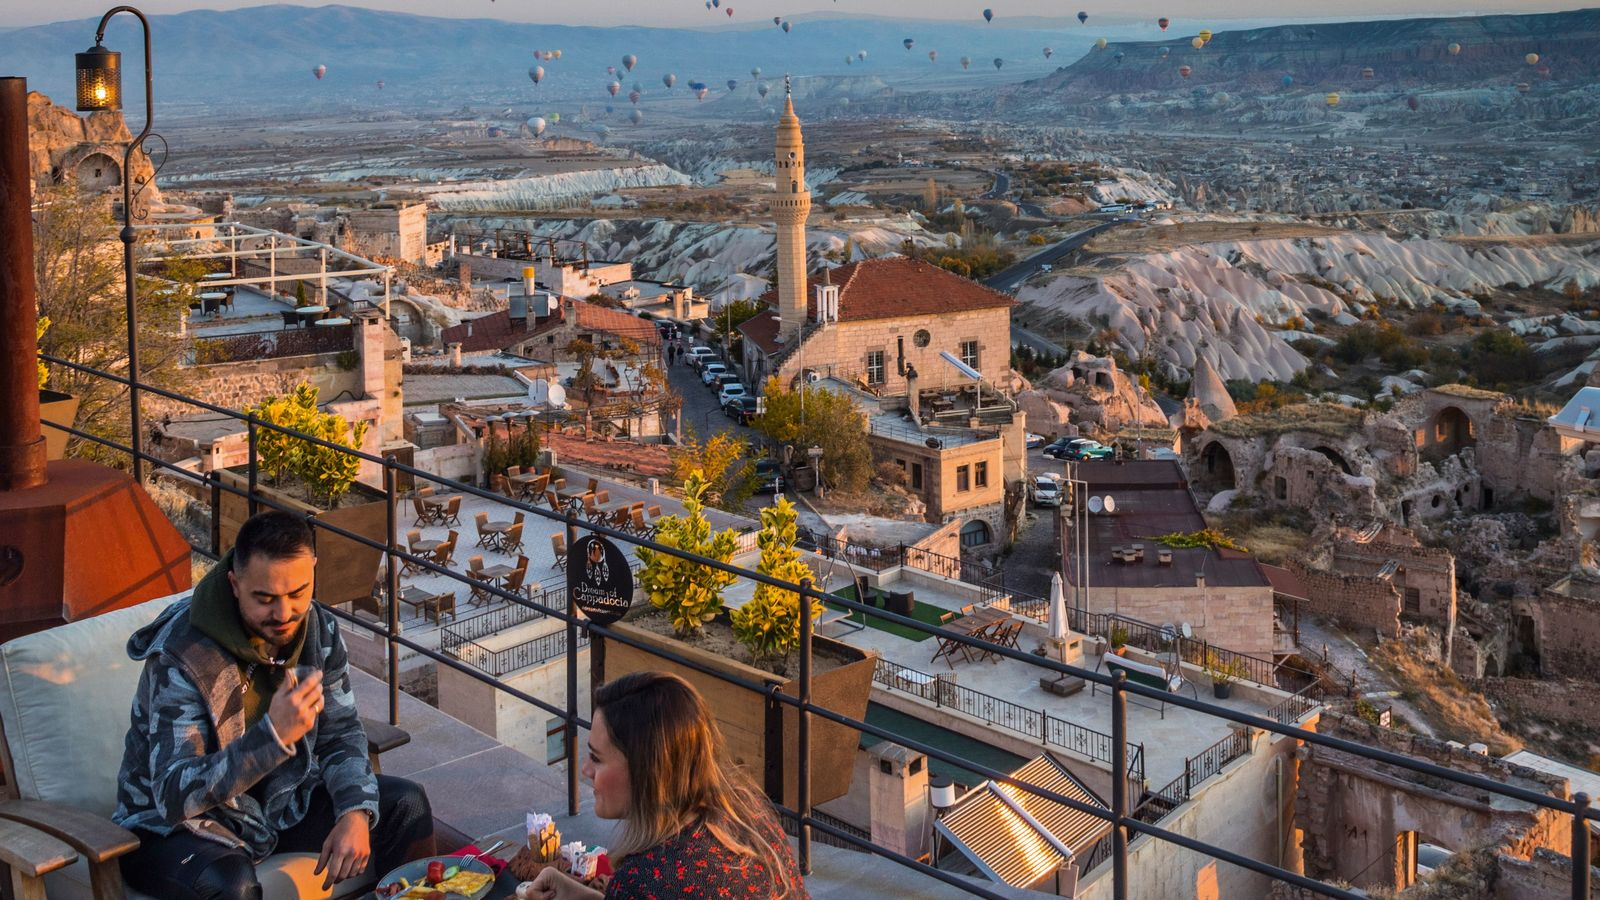 Hot air balloons take flight above Uçhisar.